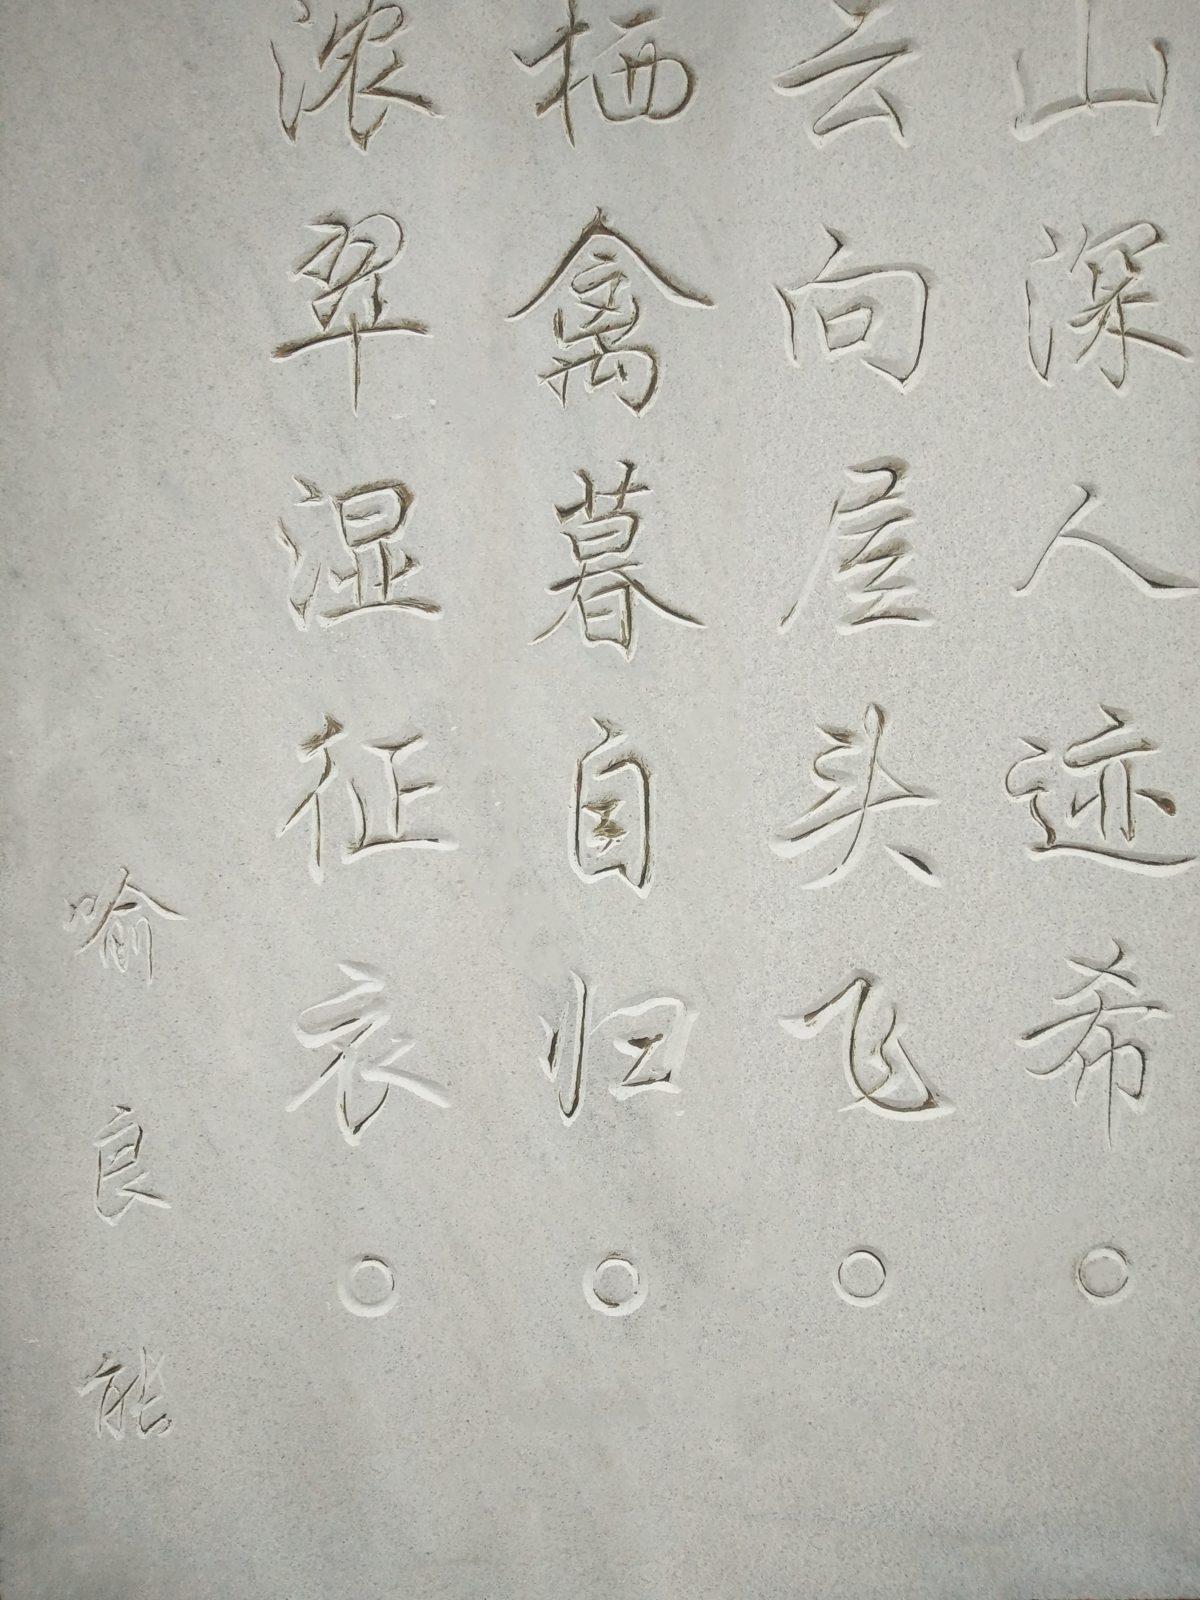 yifei-chen-730243-unsplash-1200x1600.jpg